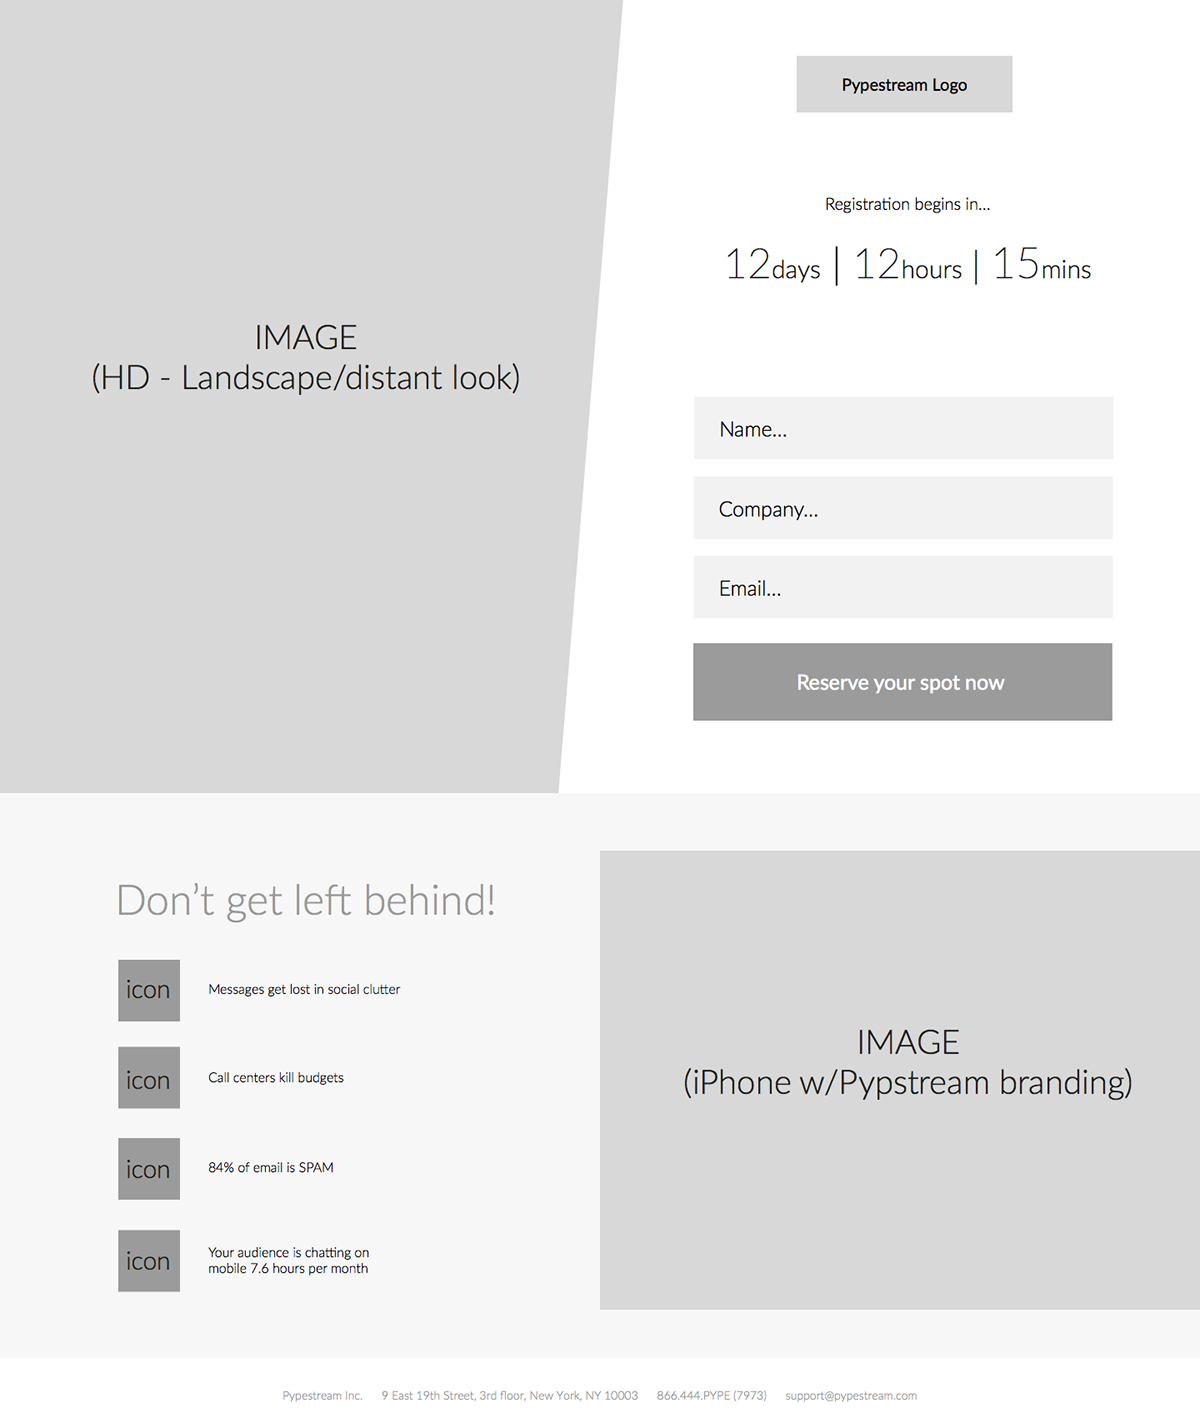 messaging messenger user experience Mockup prototype iphone macbook Layout wireframes iMac animated gif gif animation gif